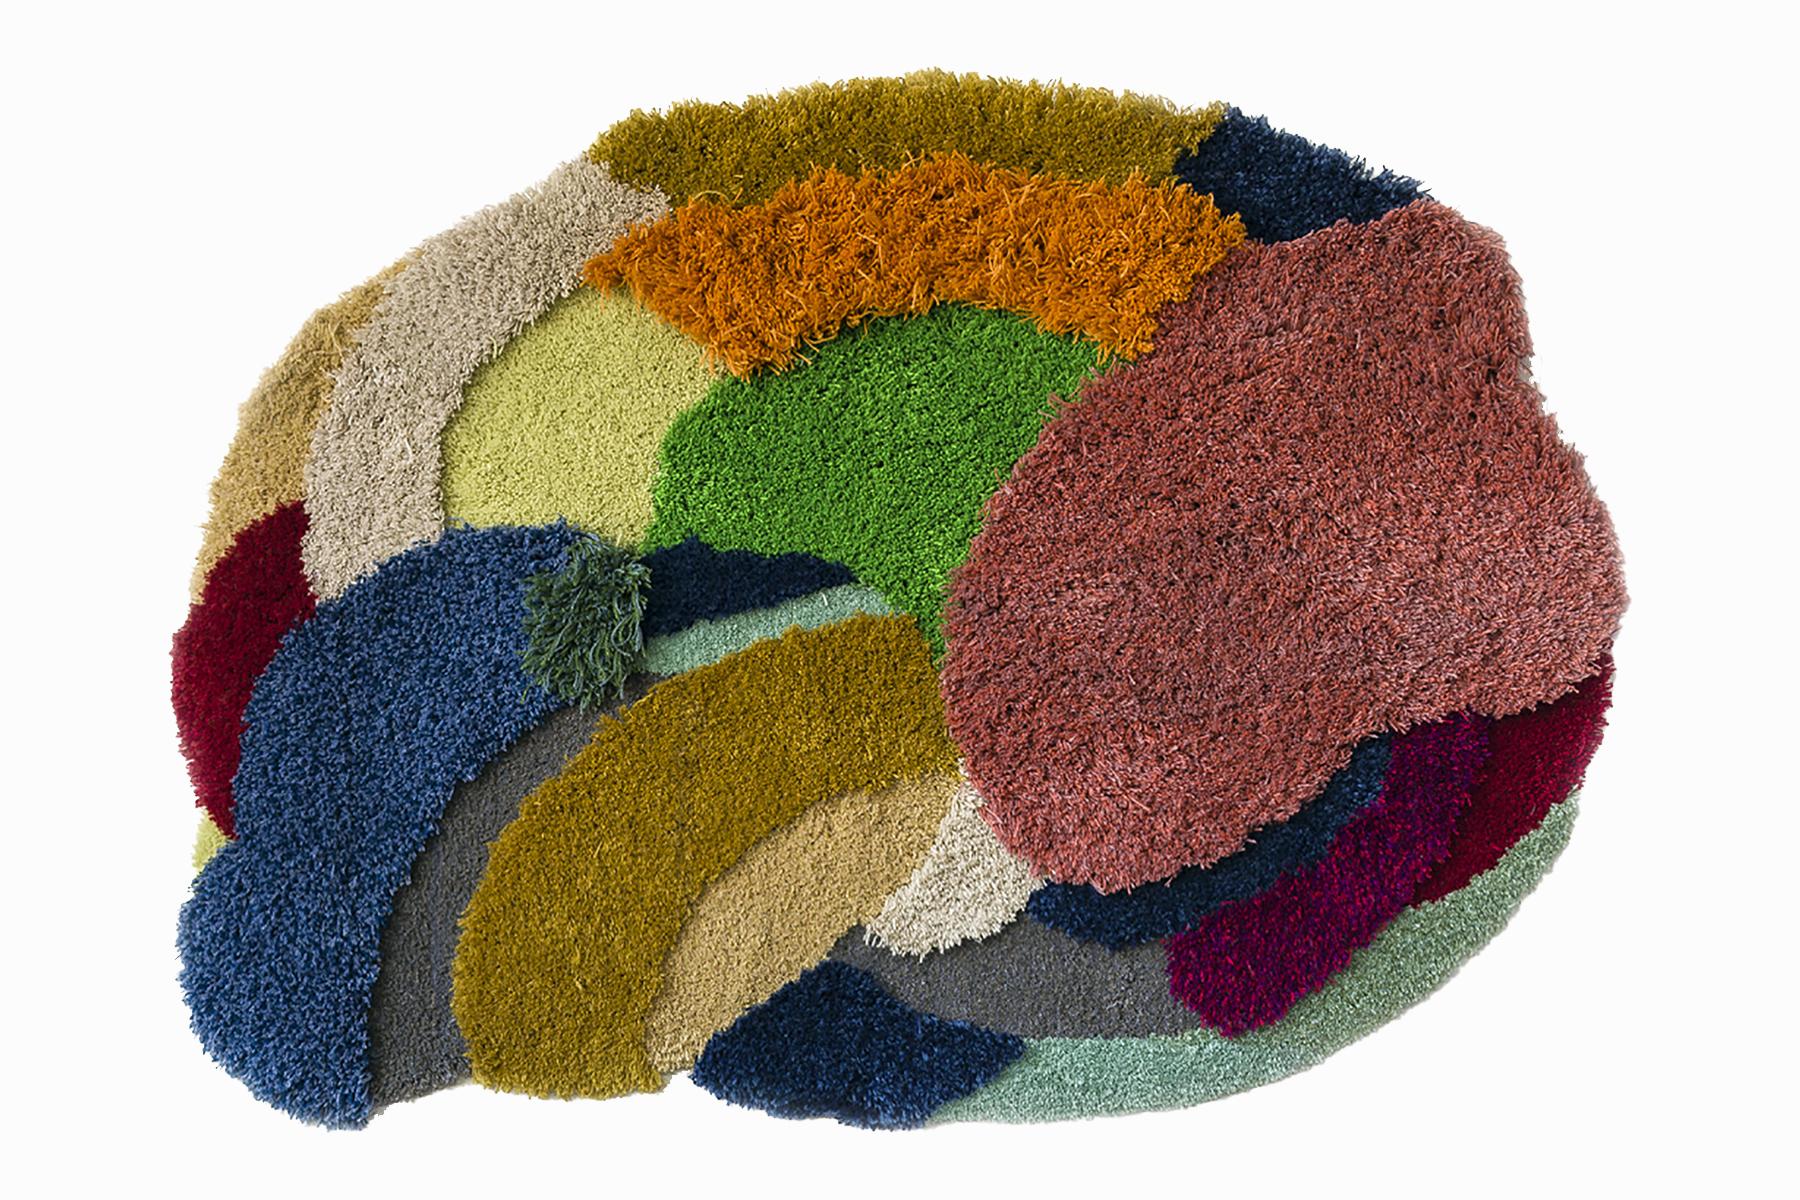 Cloud, 43 x 62 inches / 109.2 x 157.5 cm, wool yarn on wood panel, 2019